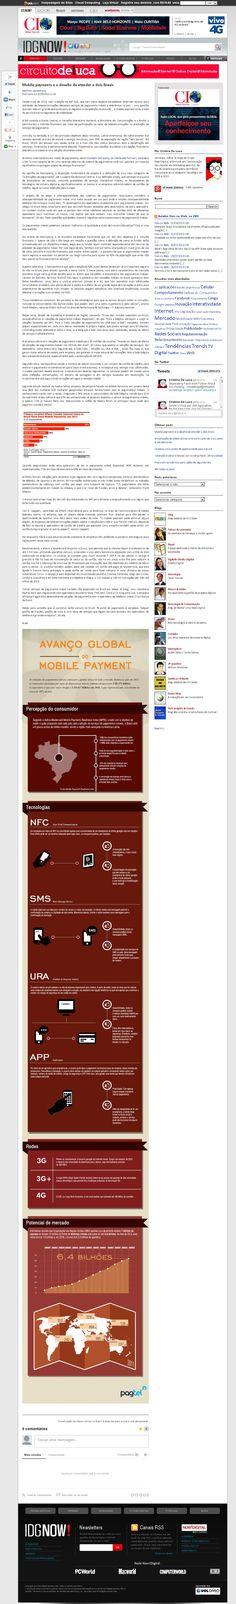 Título: Mobile payments e o desafio de atender a dois Brasis; Veículo: IDG NOW!; Data: 02/08/2013; Cliente: Pagtel.